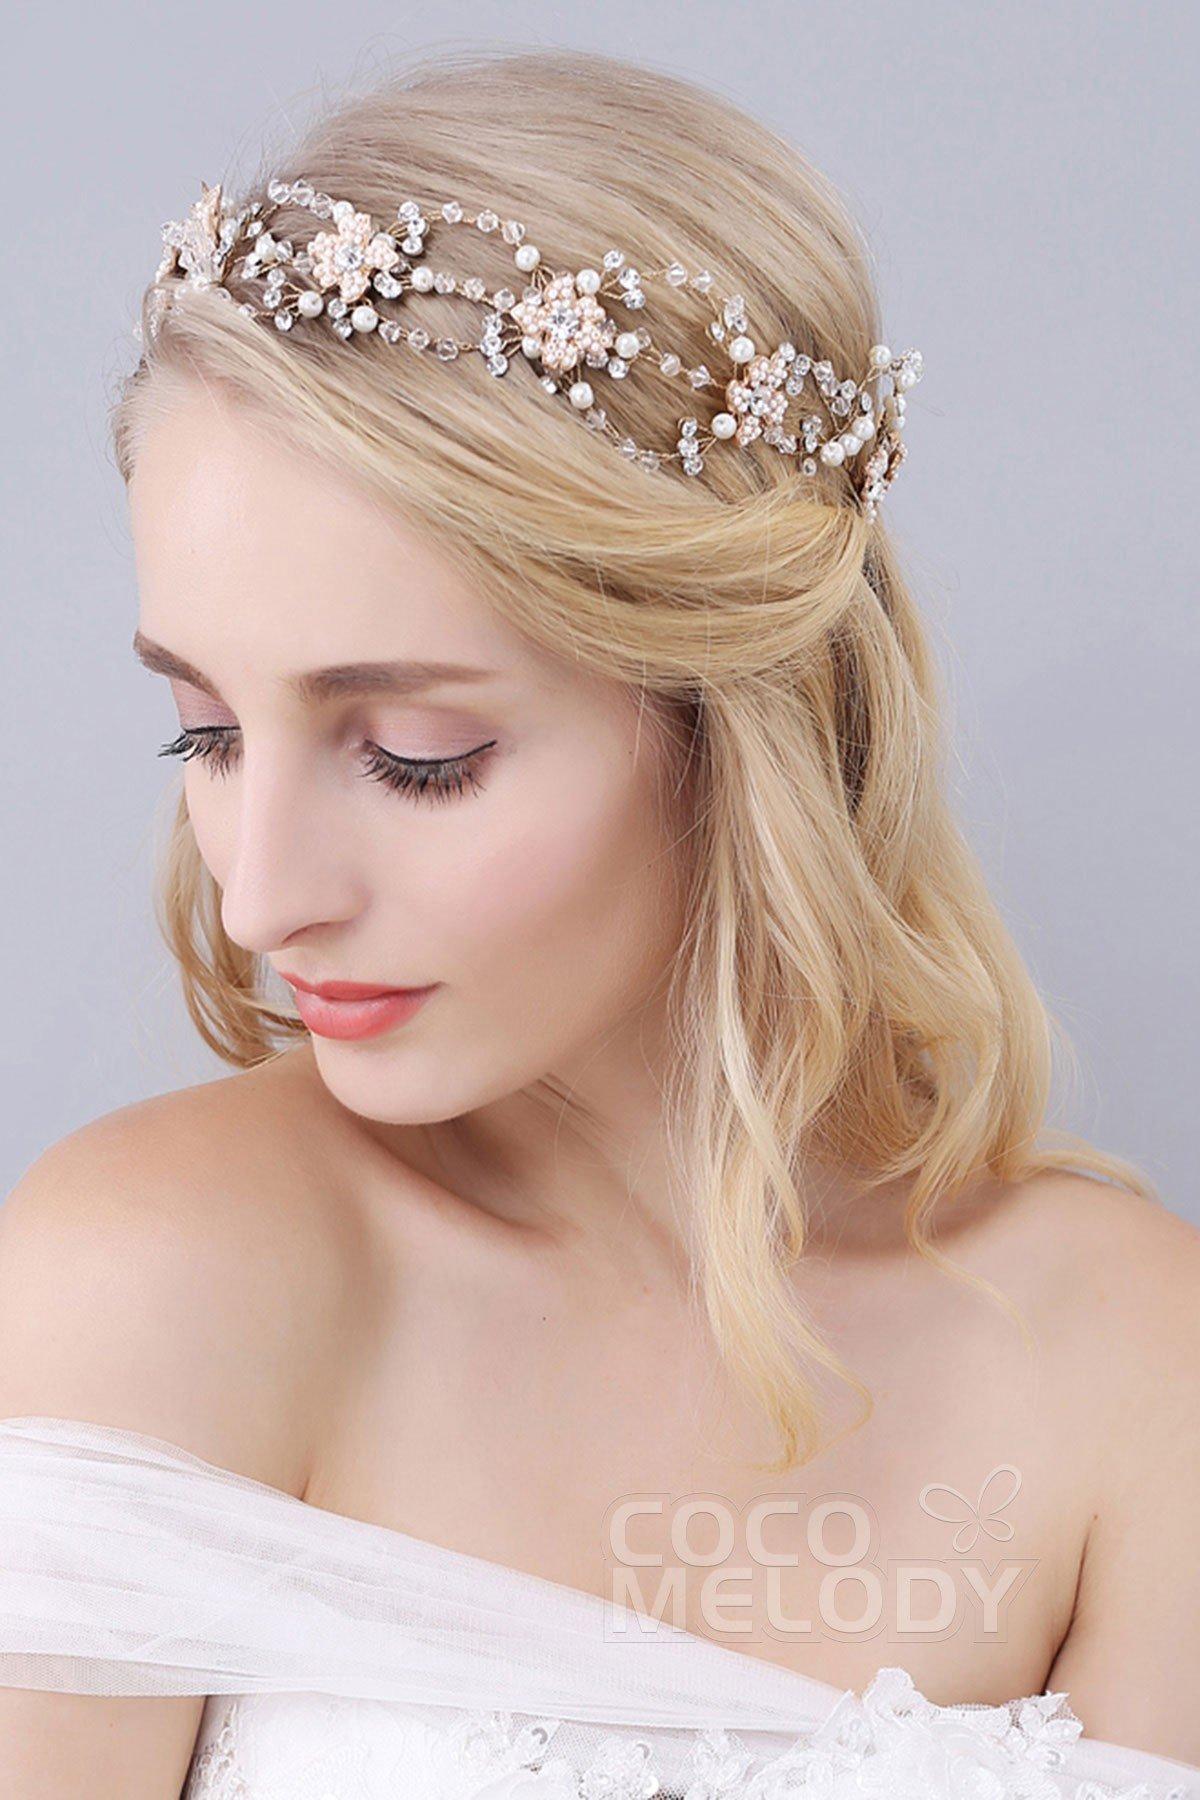 Gorgeous Gold Alloy Wedding Headbands with Rhinestone Imitation Pearl and Crystal SAH160045